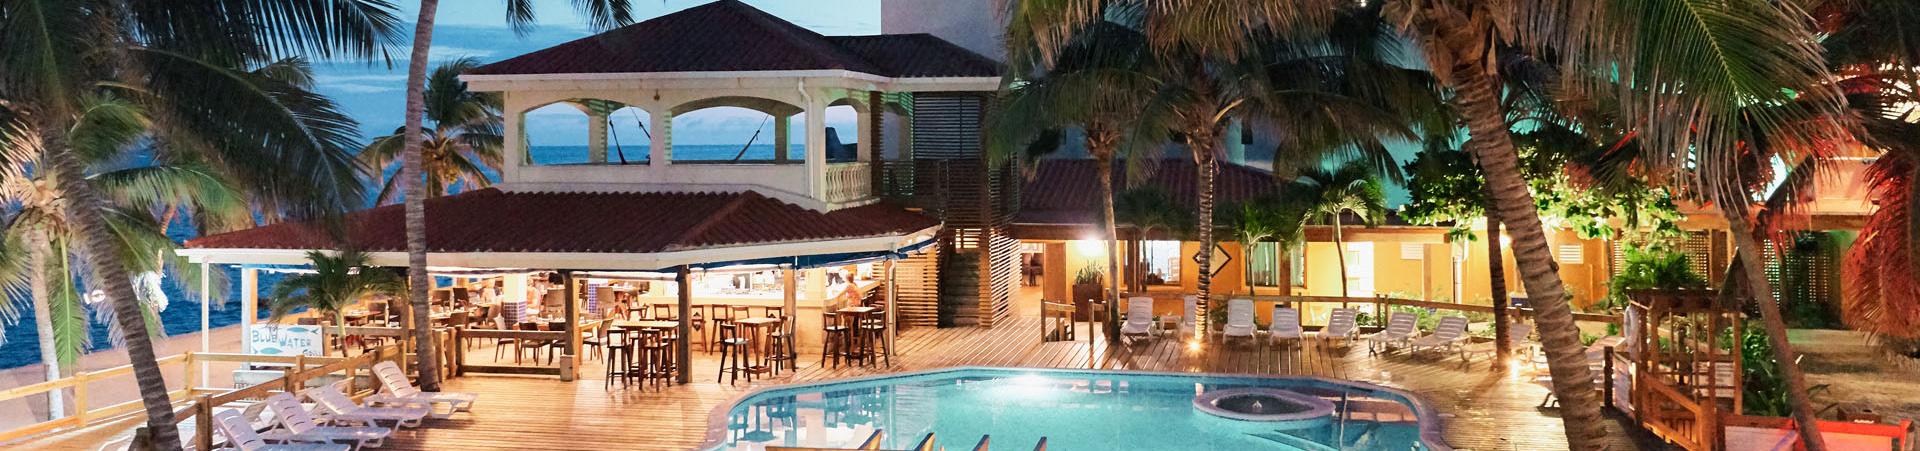 Sunbreeze Hotel at dusk Pool Bar & Restaurant